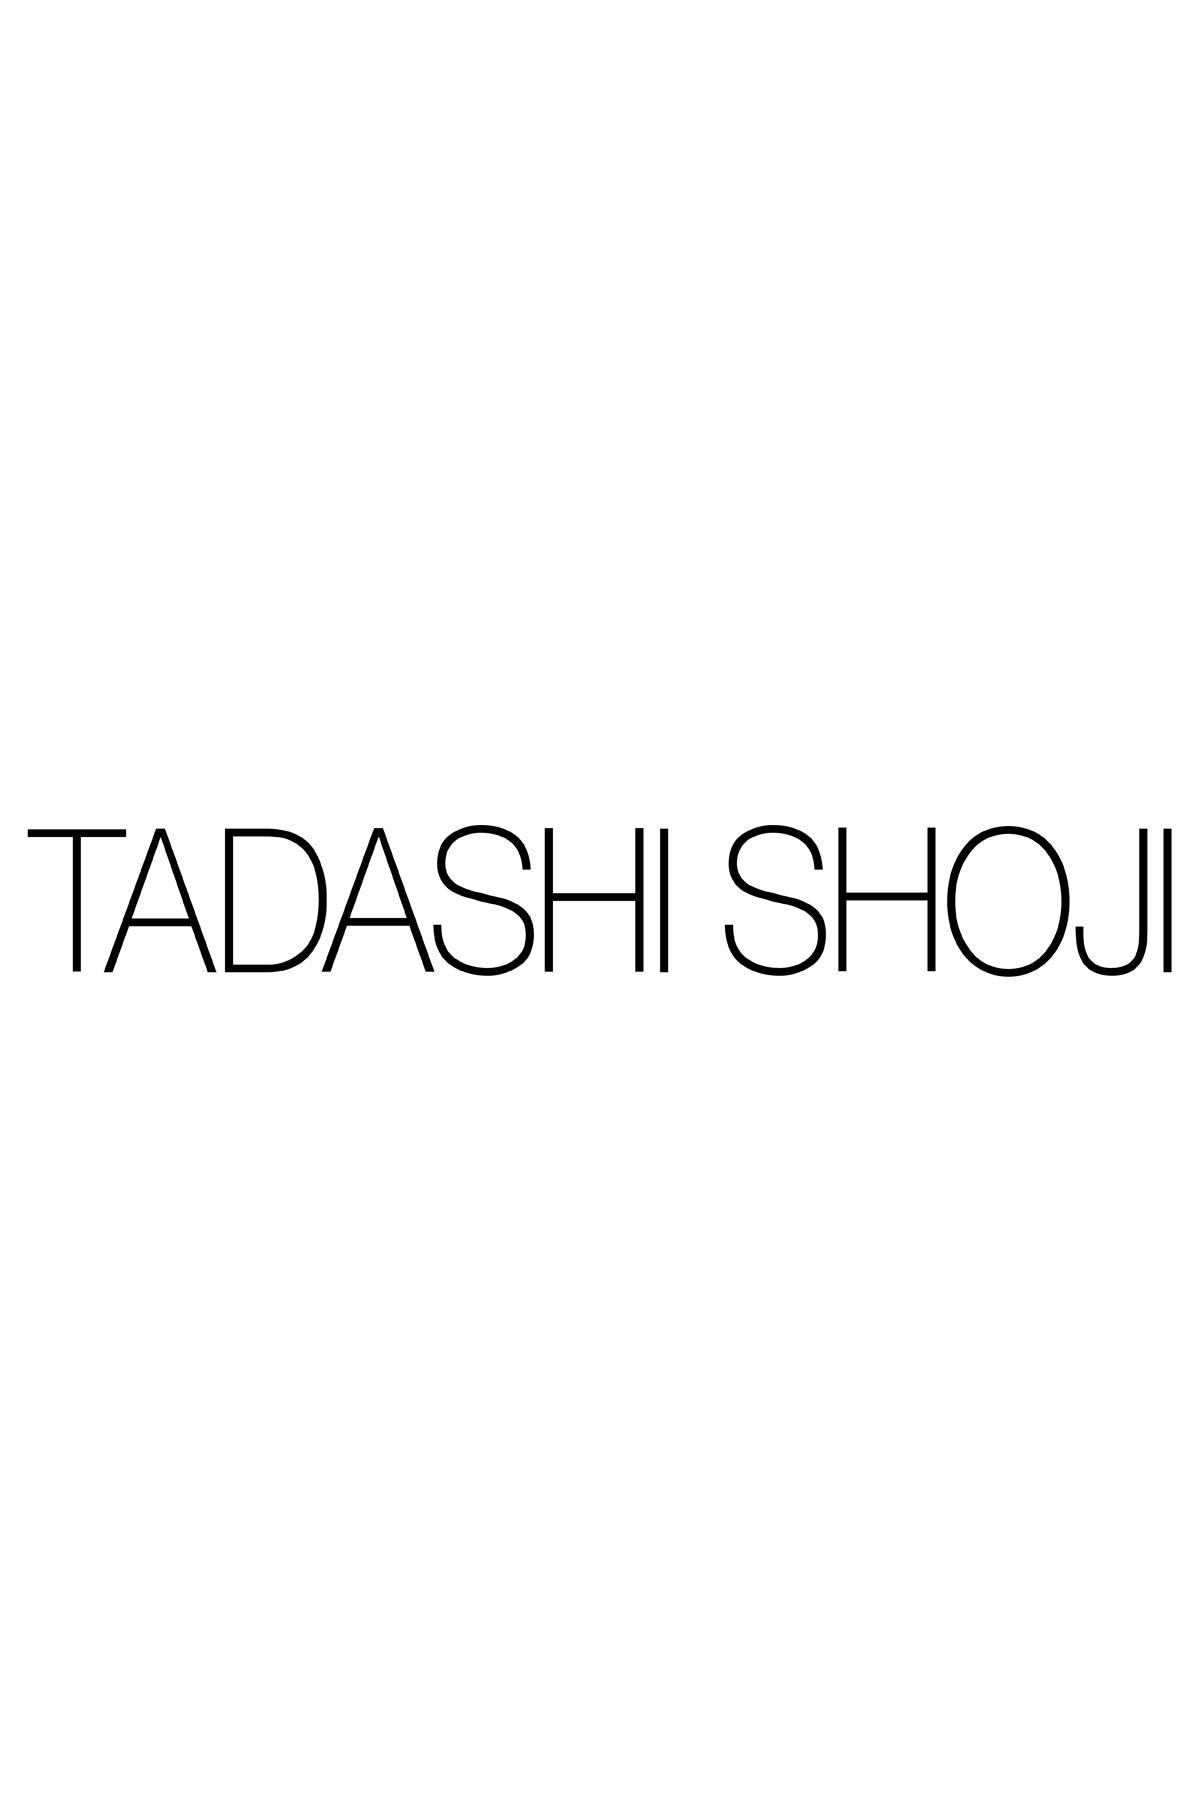 Tadashi Shoji - Kure Dress - Detail